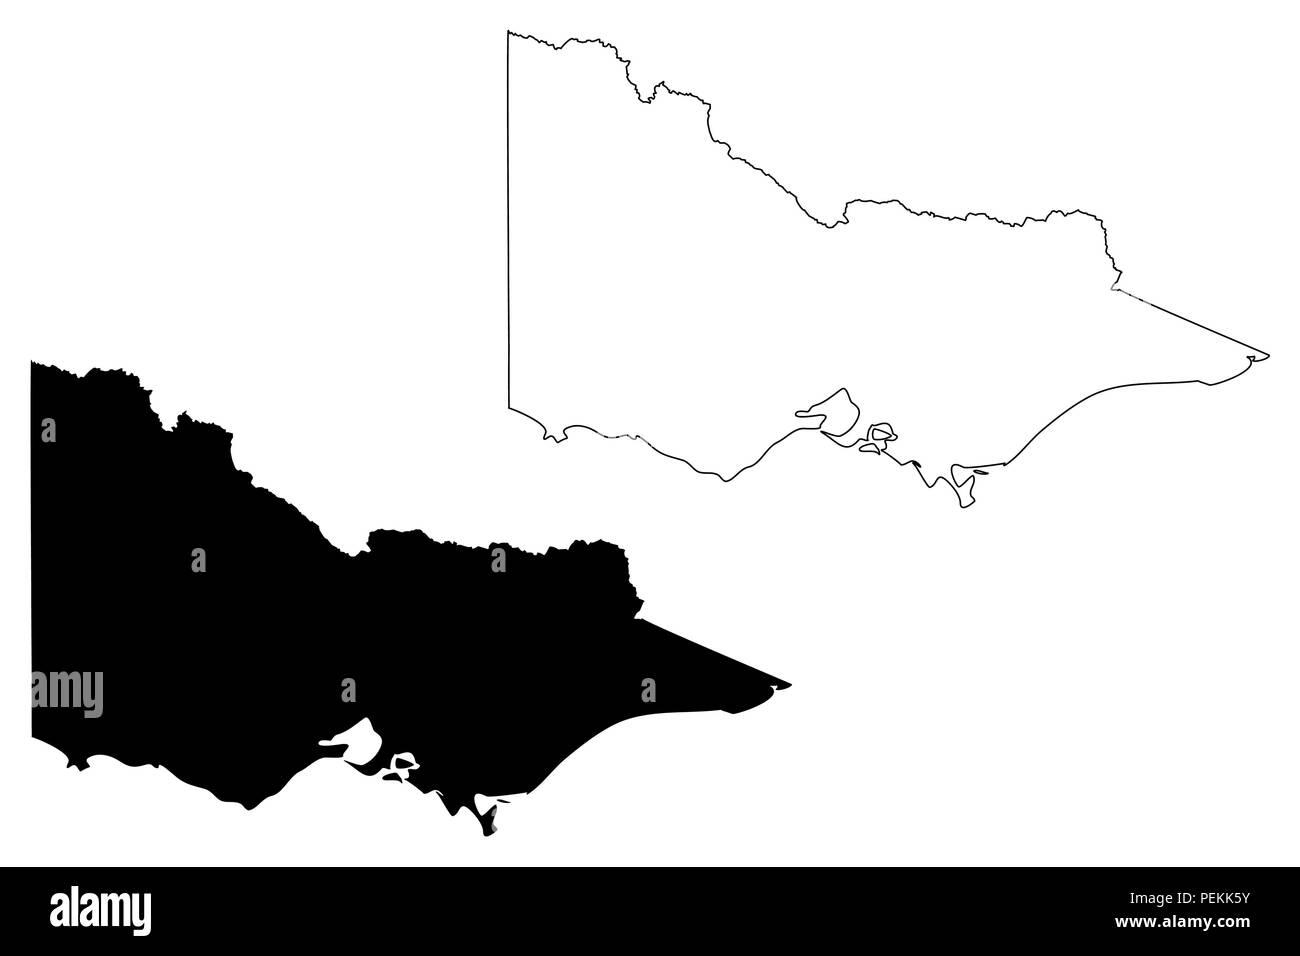 Australia Map Vector With States.Victoria Australian States And Territories Vic Map Vector